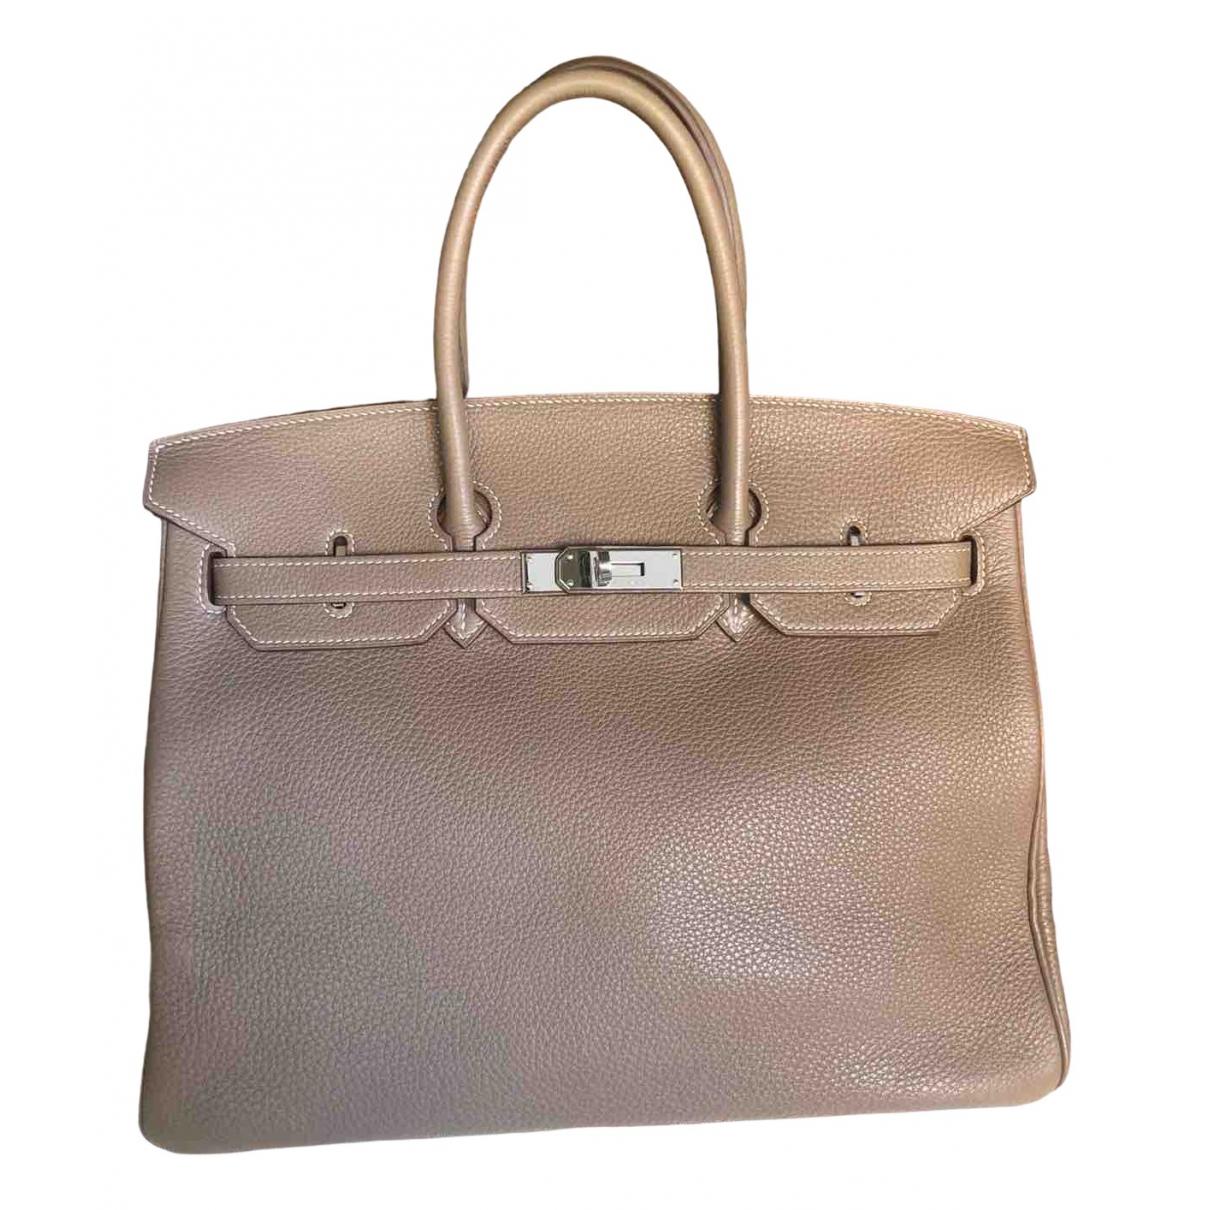 Hermes Birkin 35 Handtasche in  Grau Leder